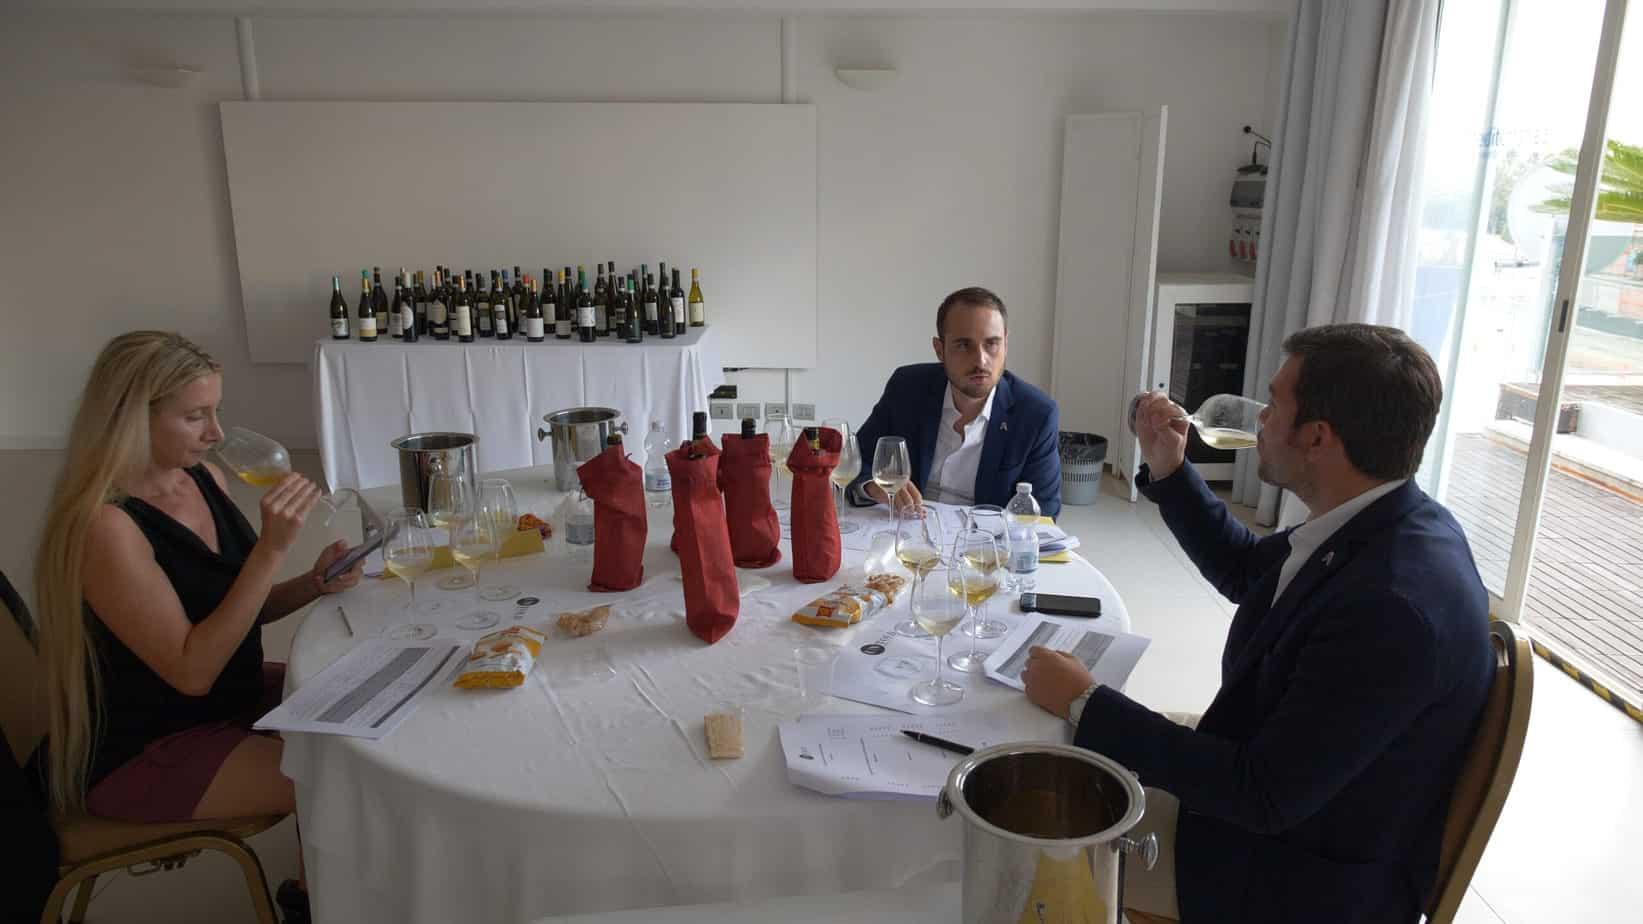 Verdicchio Untold - Commissioni Degustazione